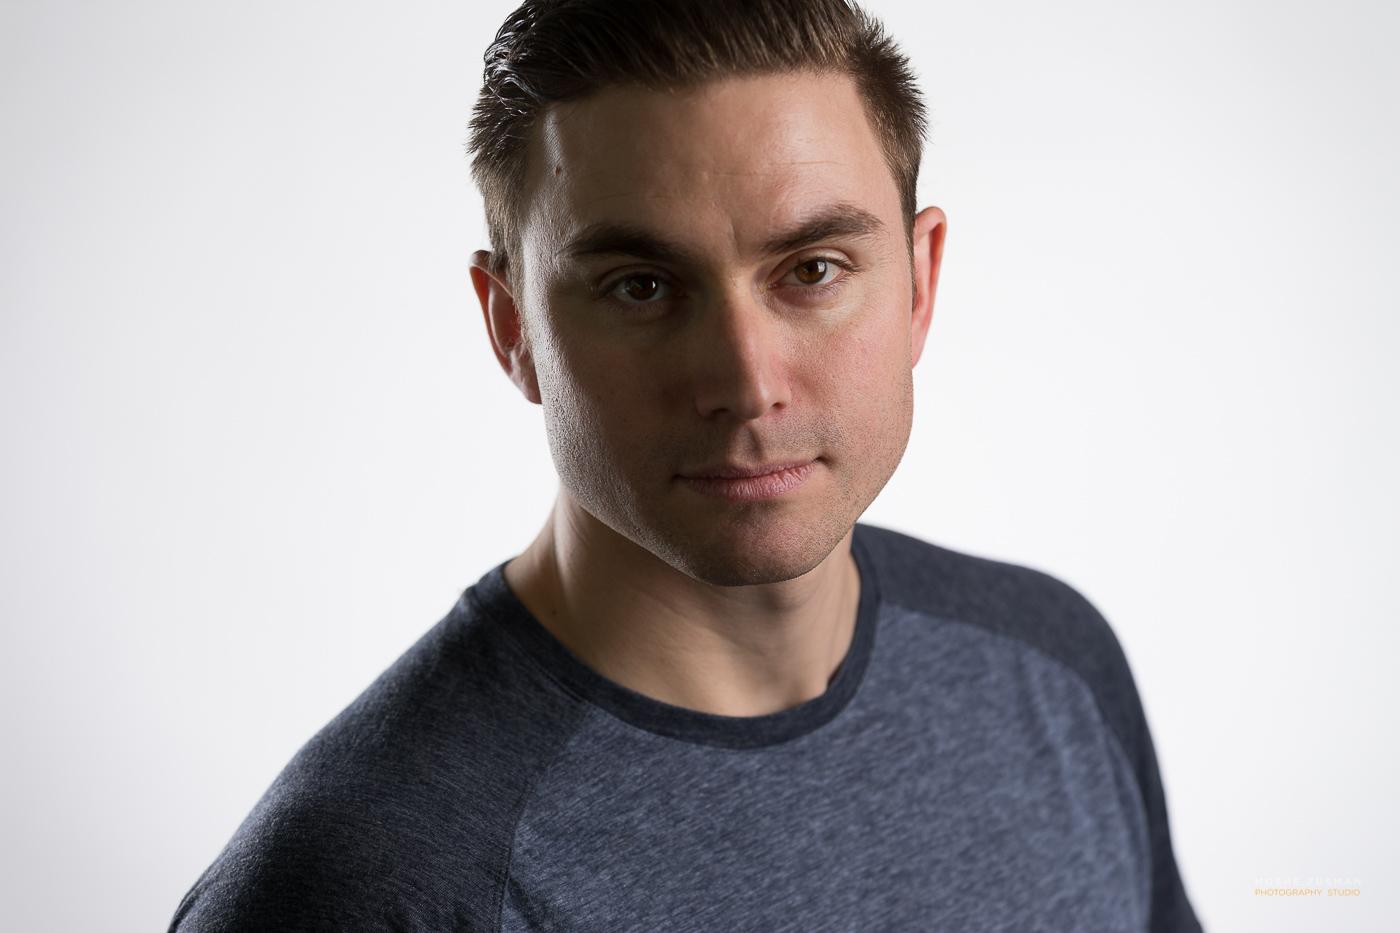 DC Headshot Photographer